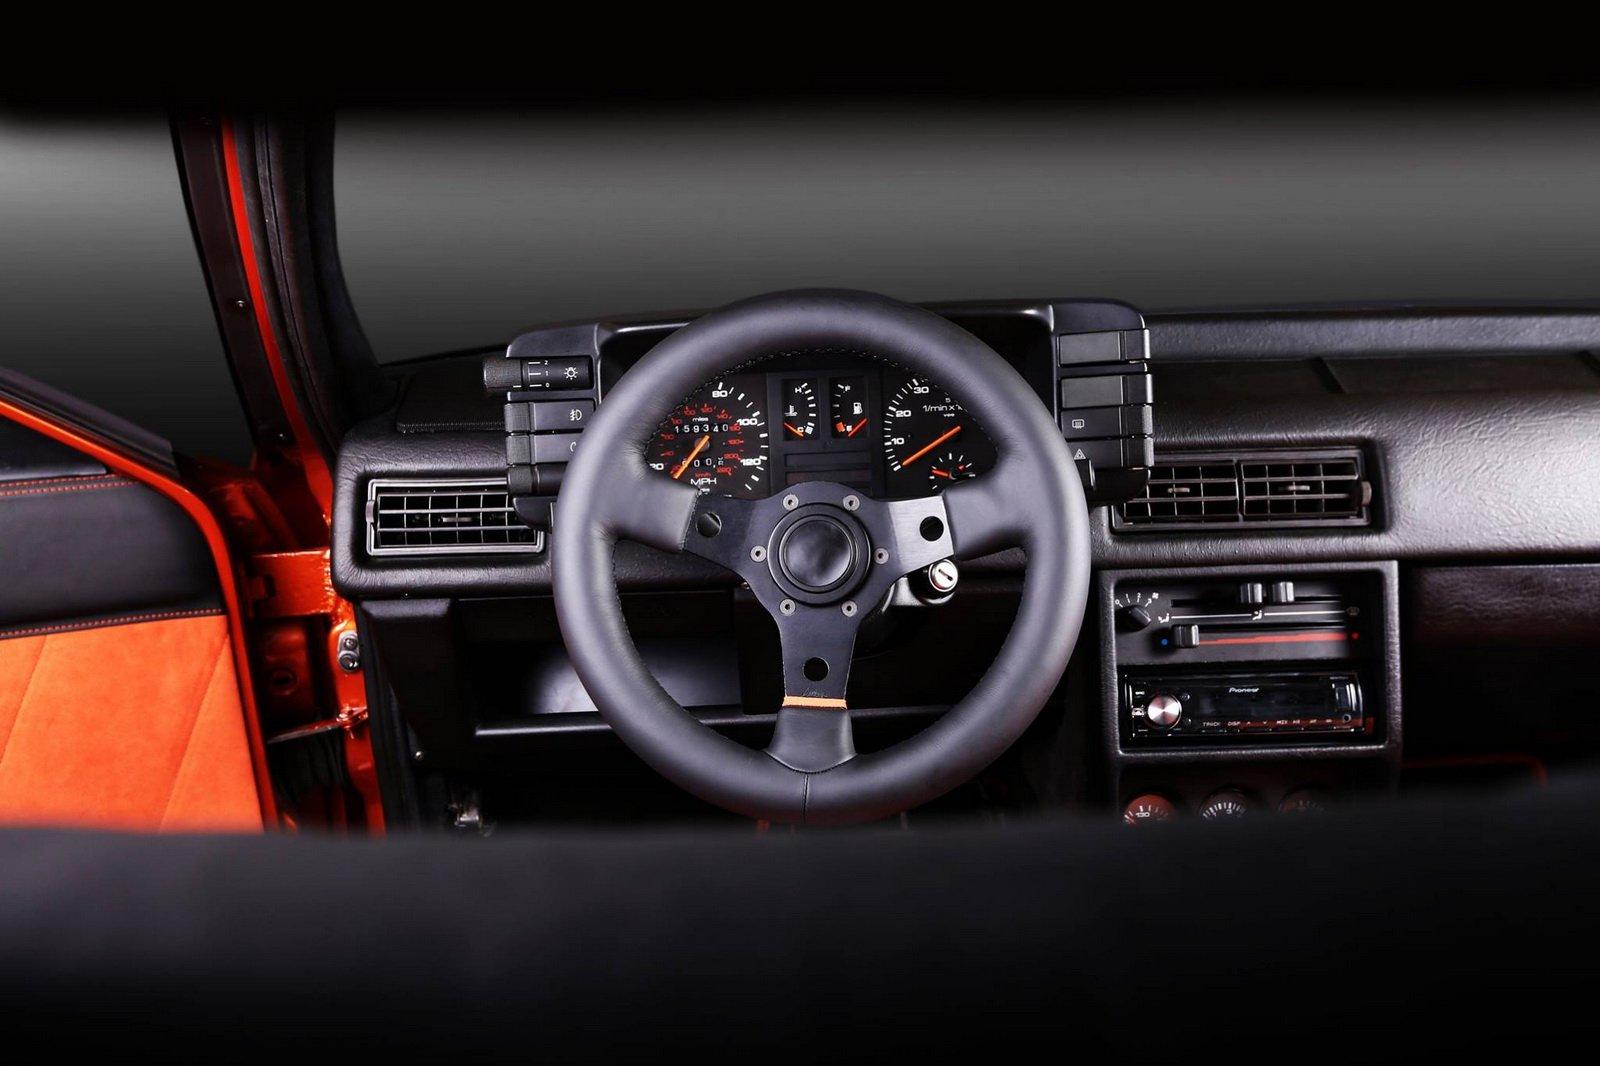 1477150853 audi coupe 16 - Carbon Motors преобразили интерьер Audi B2